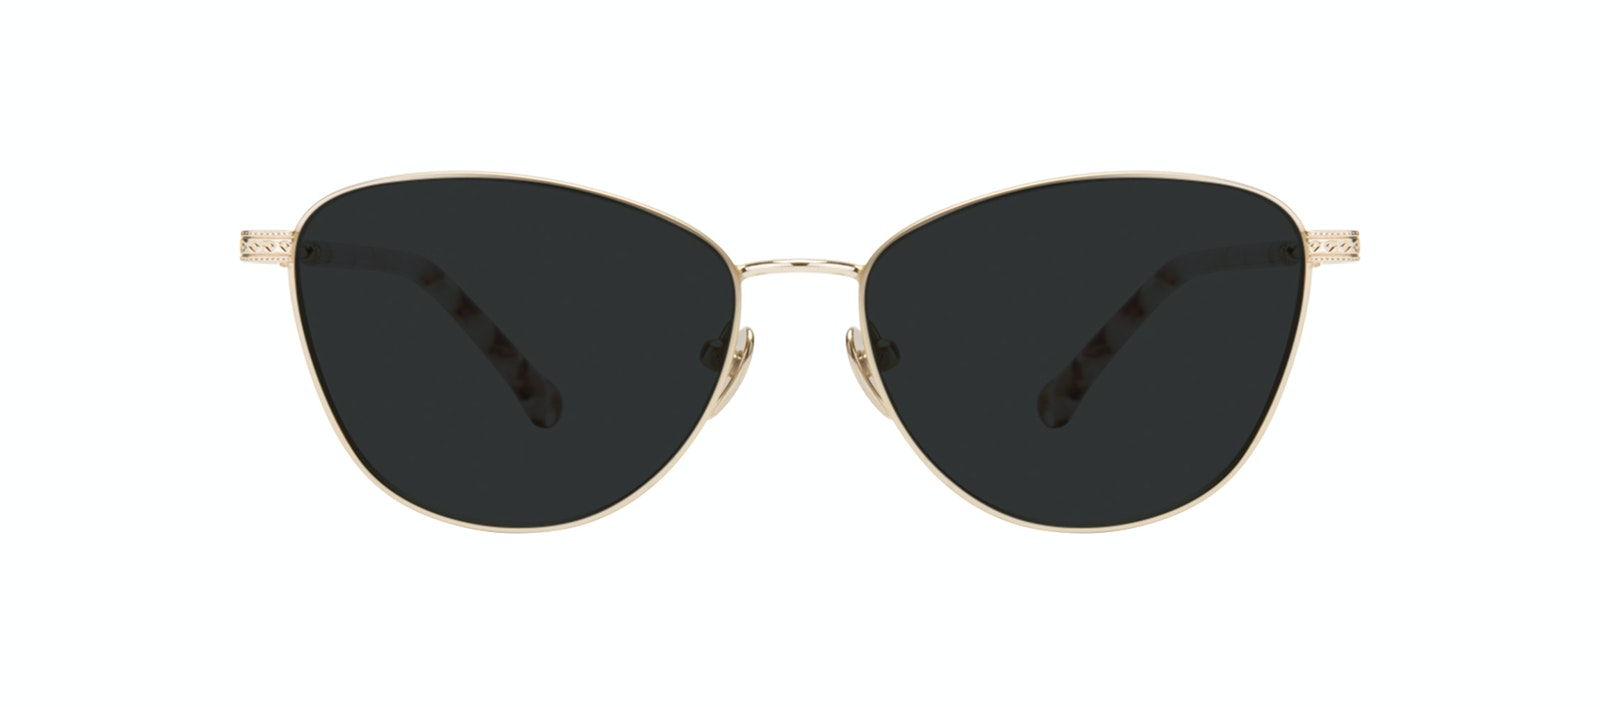 Affordable Fashion Glasses Cat Eye Sunglasses Women Bow Golden Quartz Front